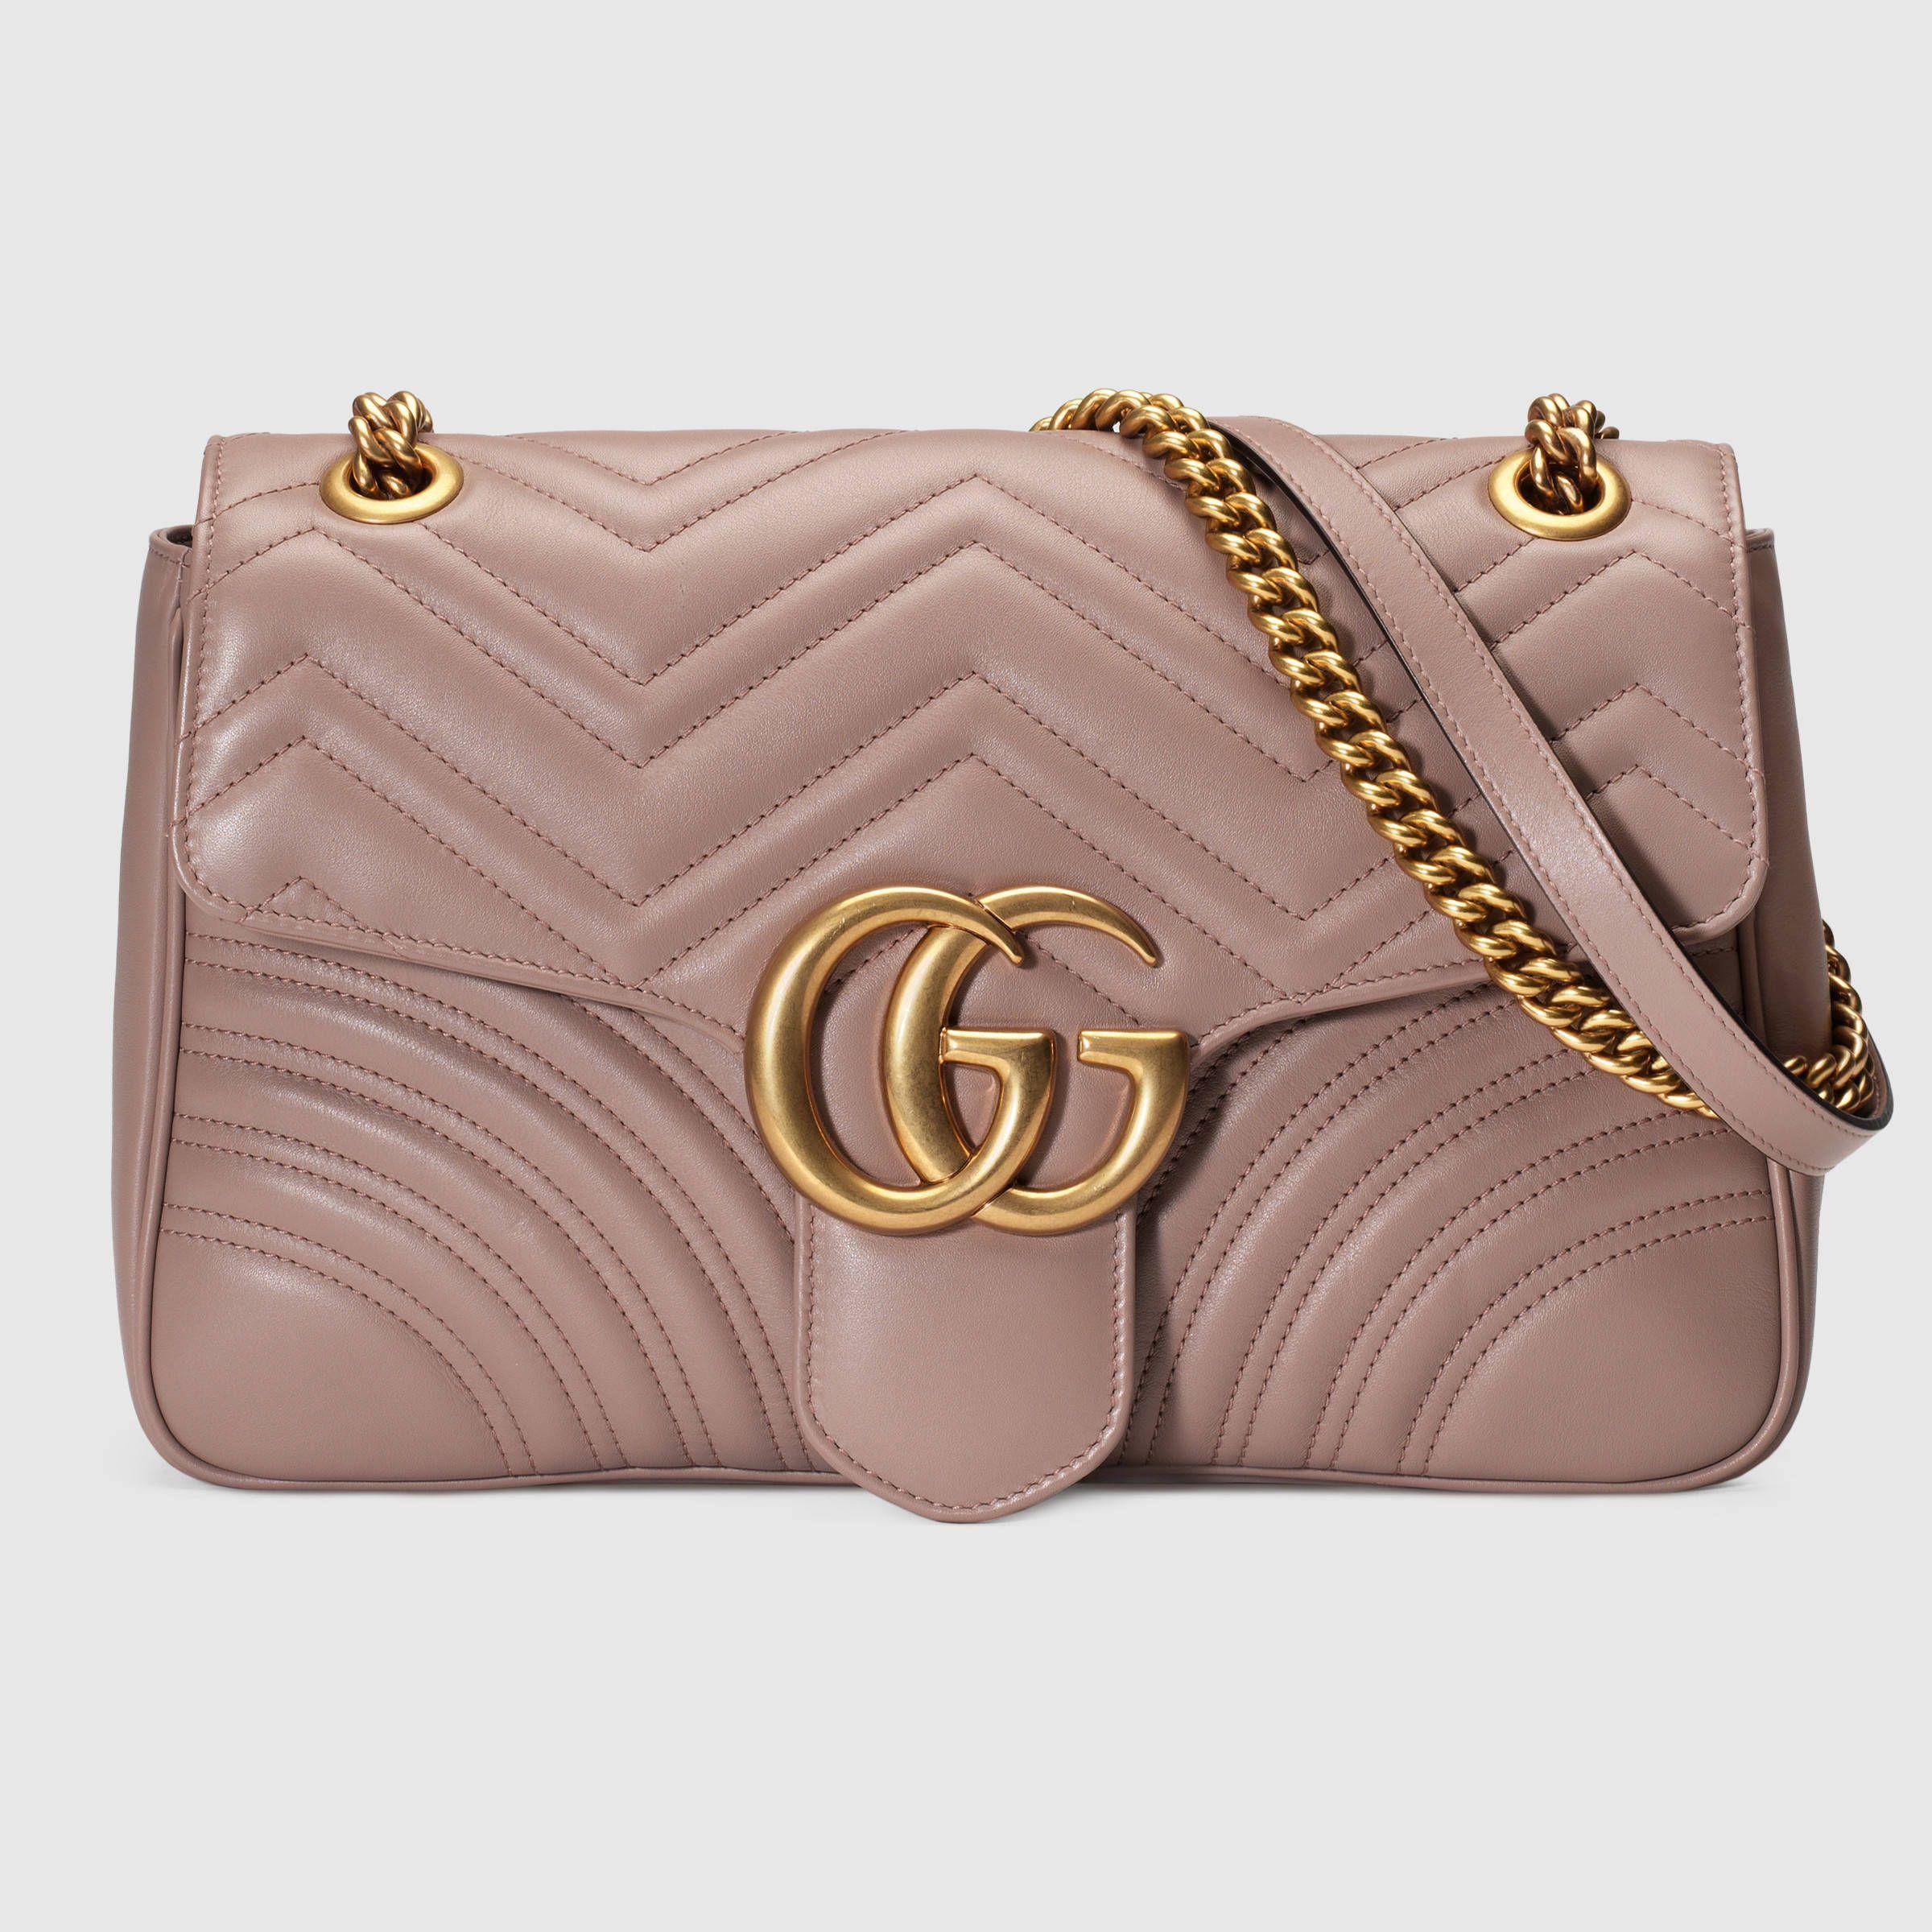 12edc9794134 GG Marmont medium matelassé shoulder bag | Wish List | Gucci ...